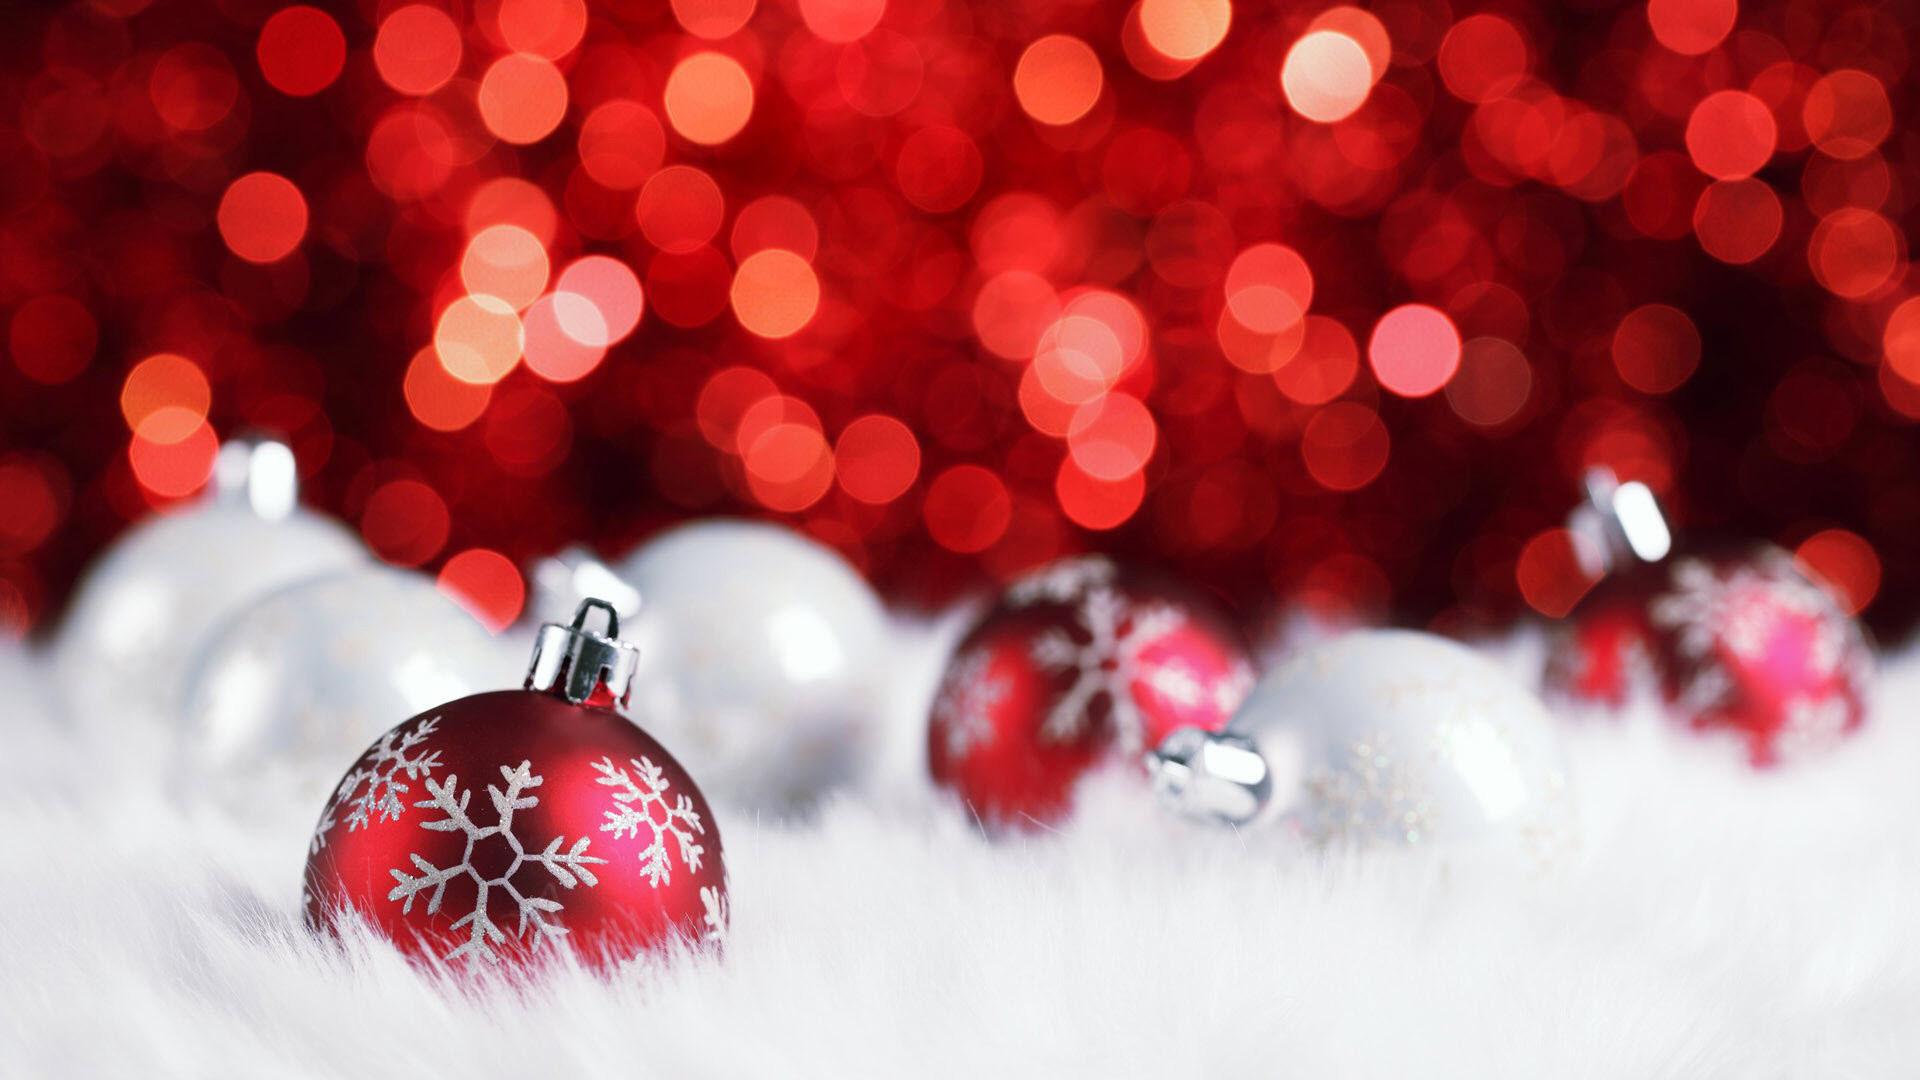 Christmas Desktop Background.Cute Christmas Desktop Wallpaper 72 Images